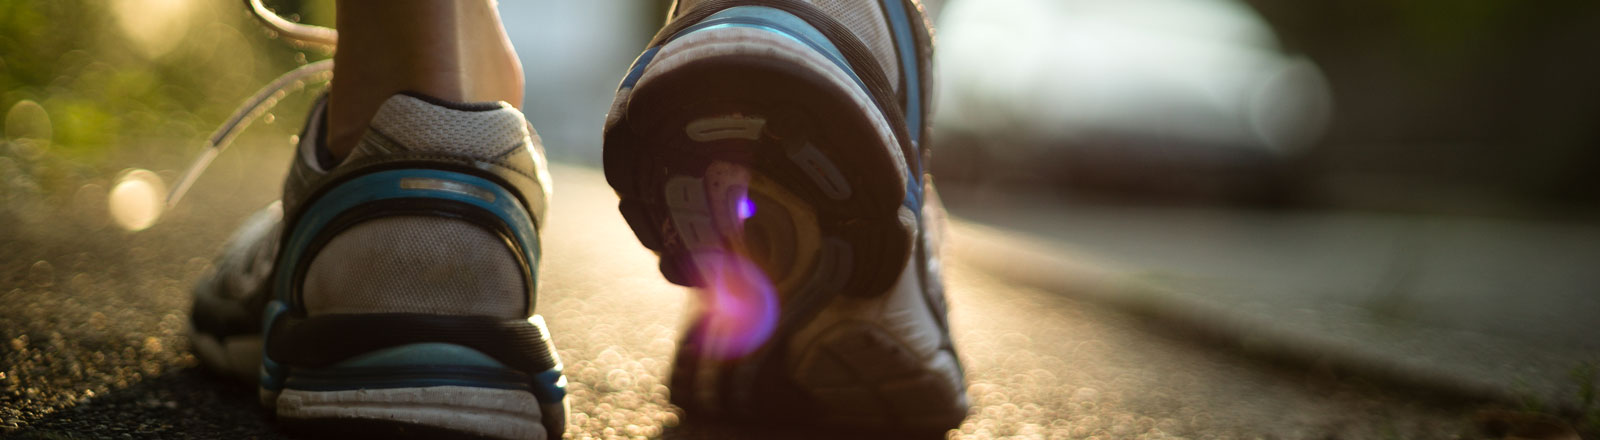 Eine Frau trägt Laufschuhe.